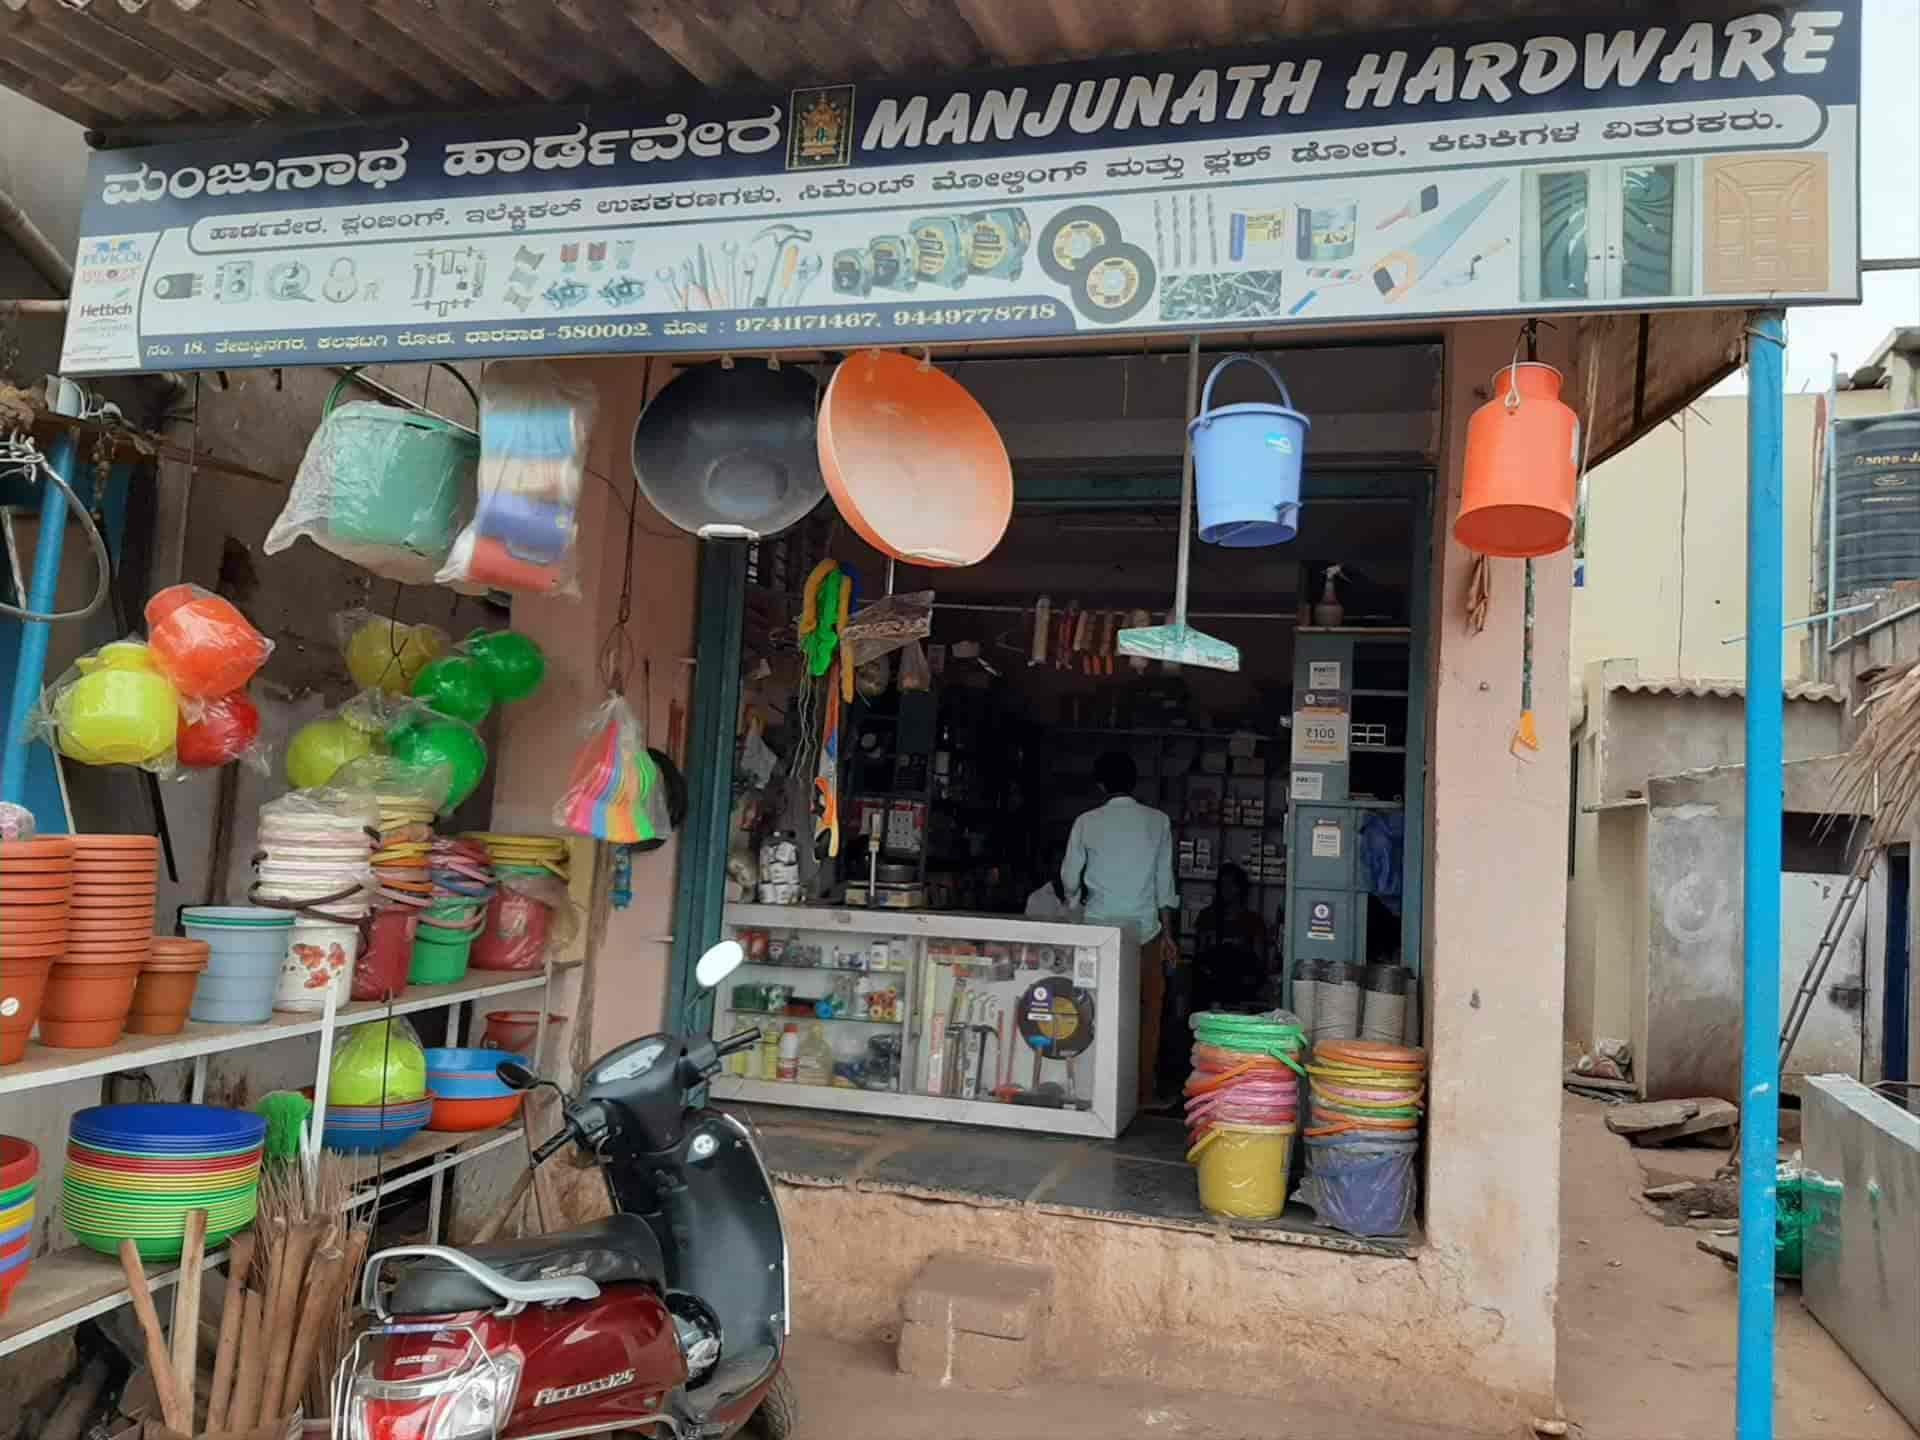 Manjunath Hardware, Tejaswinagar - Hardware Shops in Dharwad